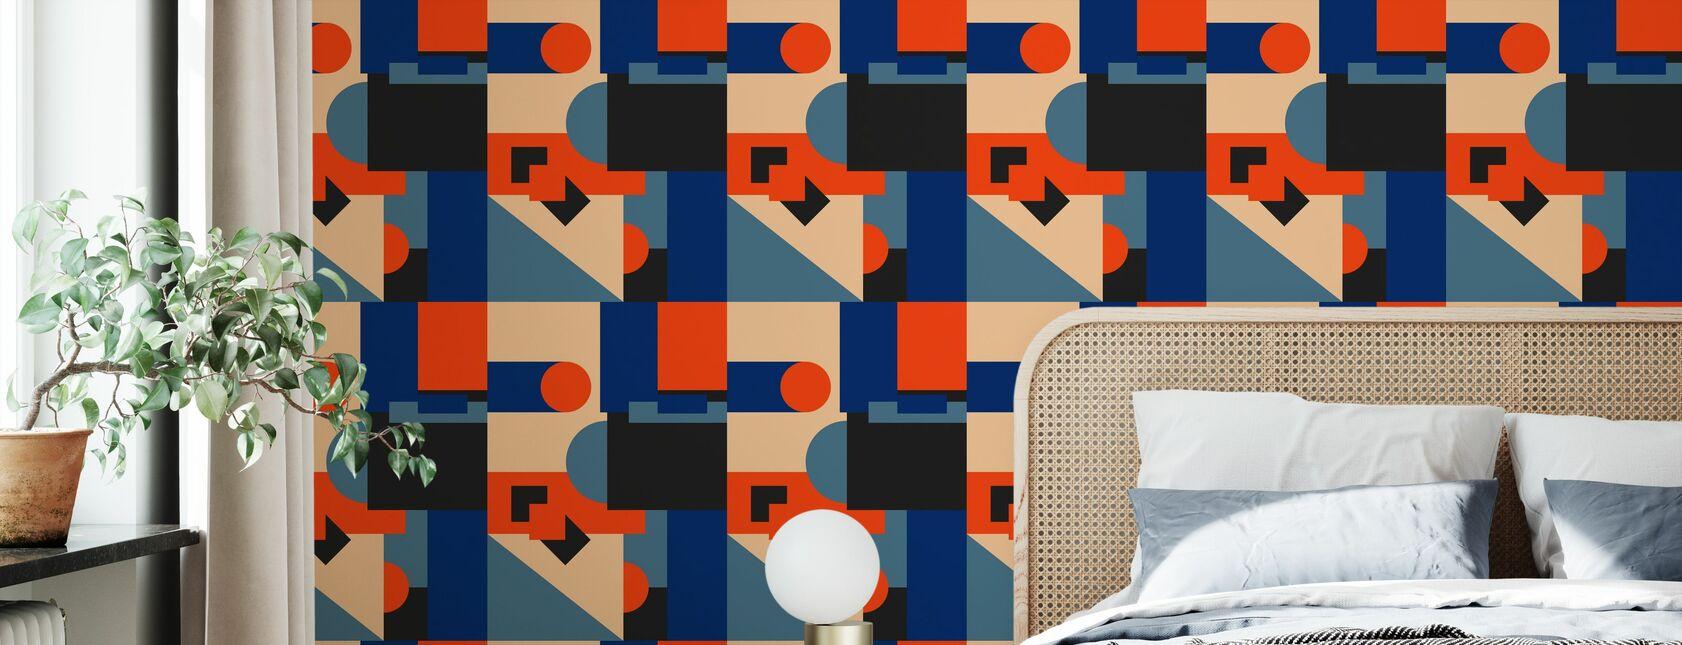 Jazz - Papier peint - Chambre